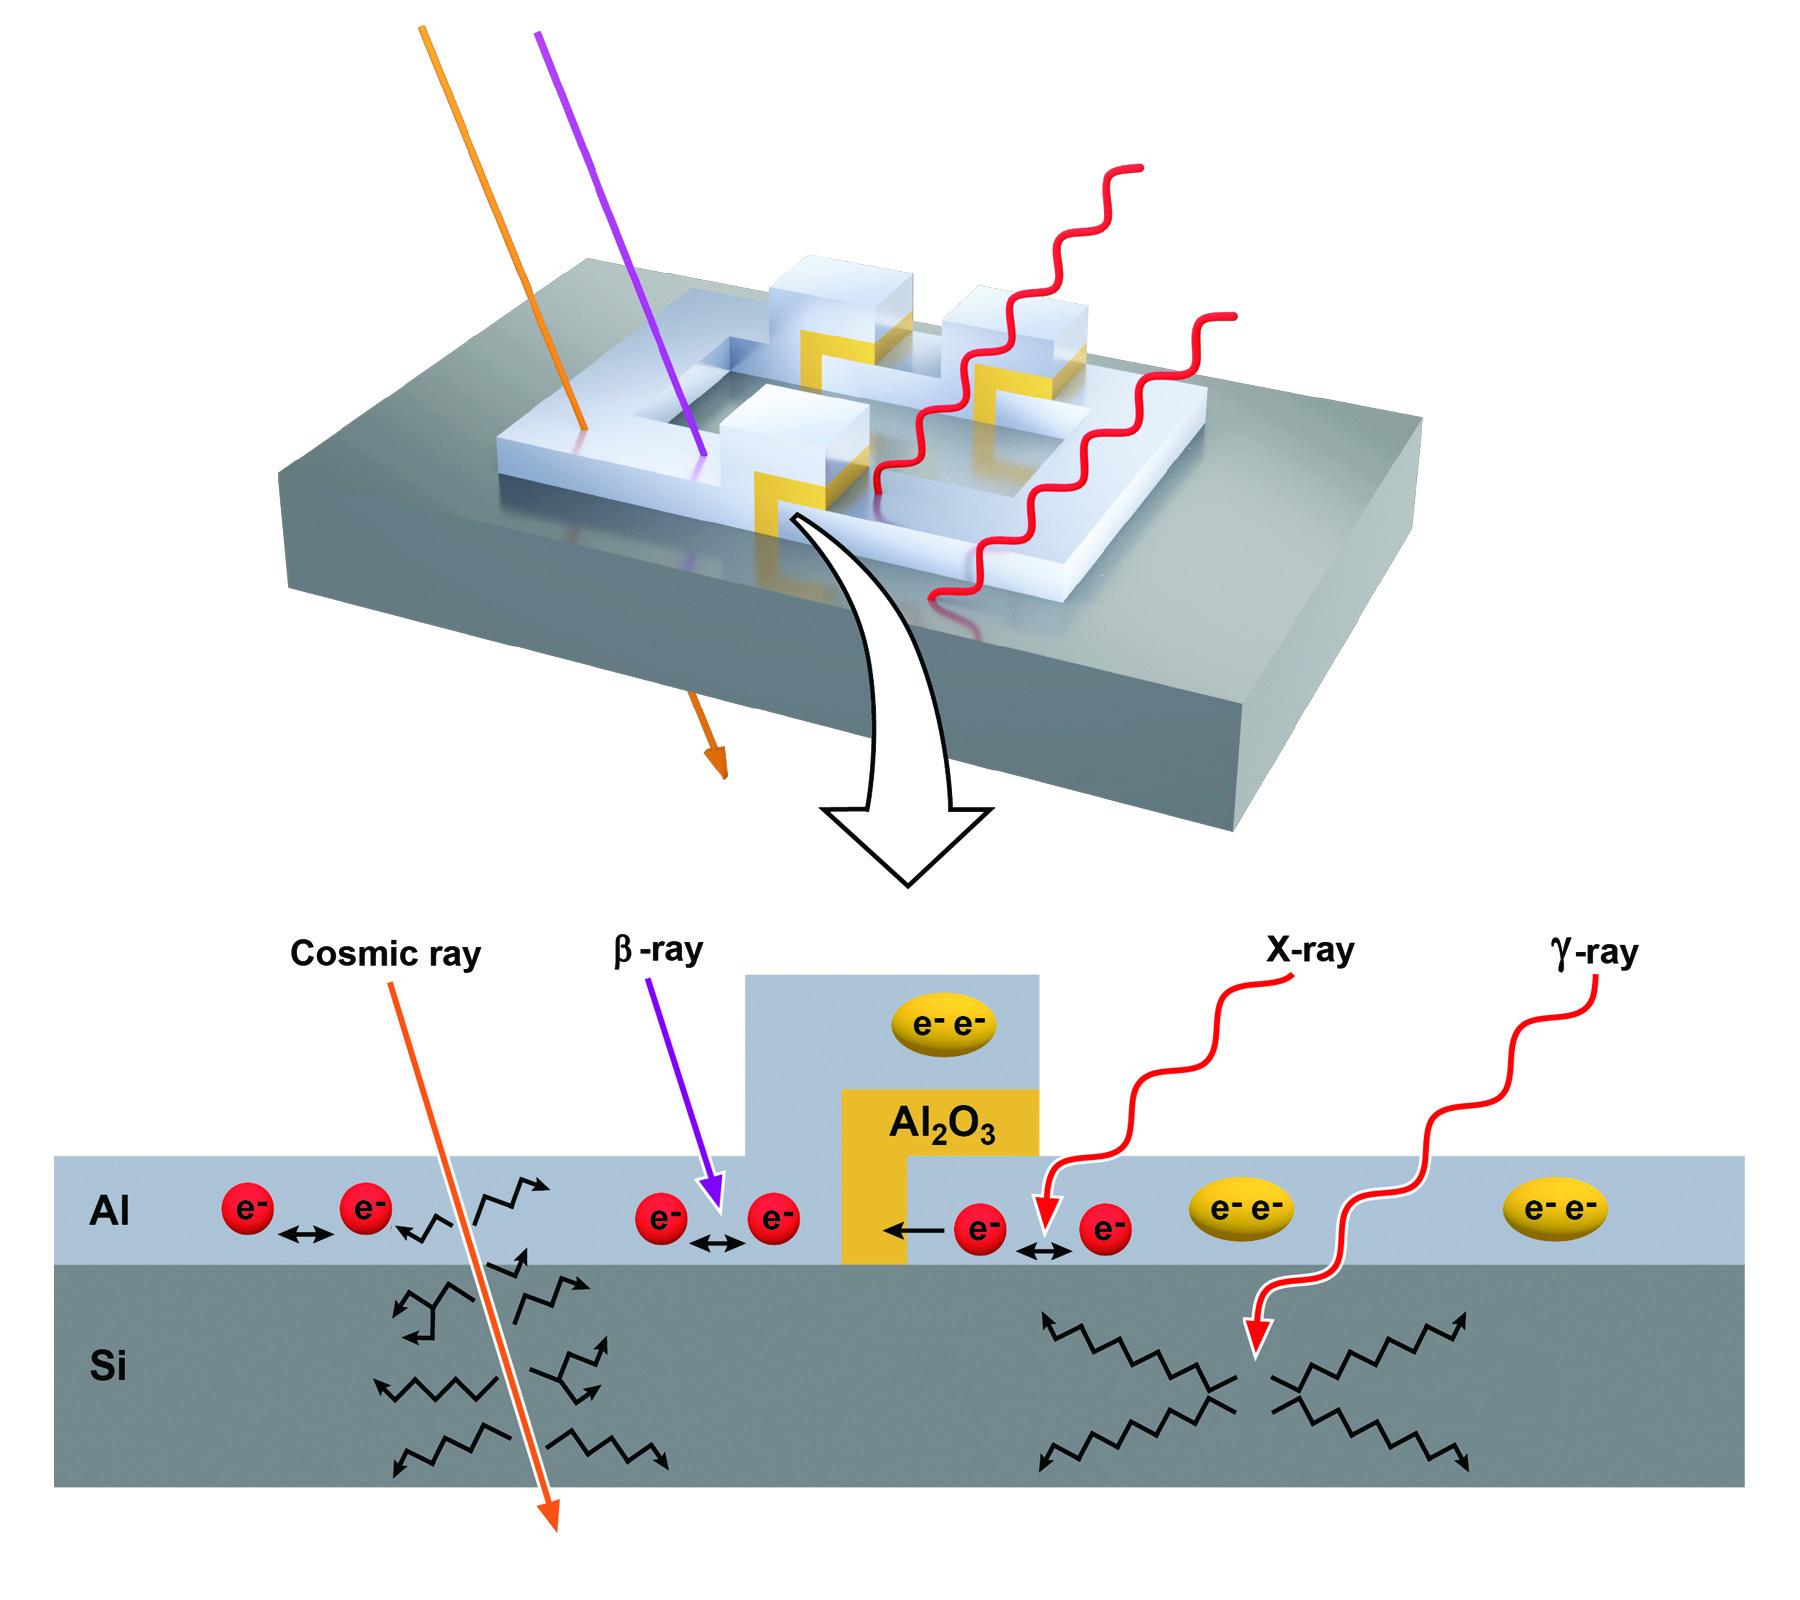 Radiation exposure effect on qubits